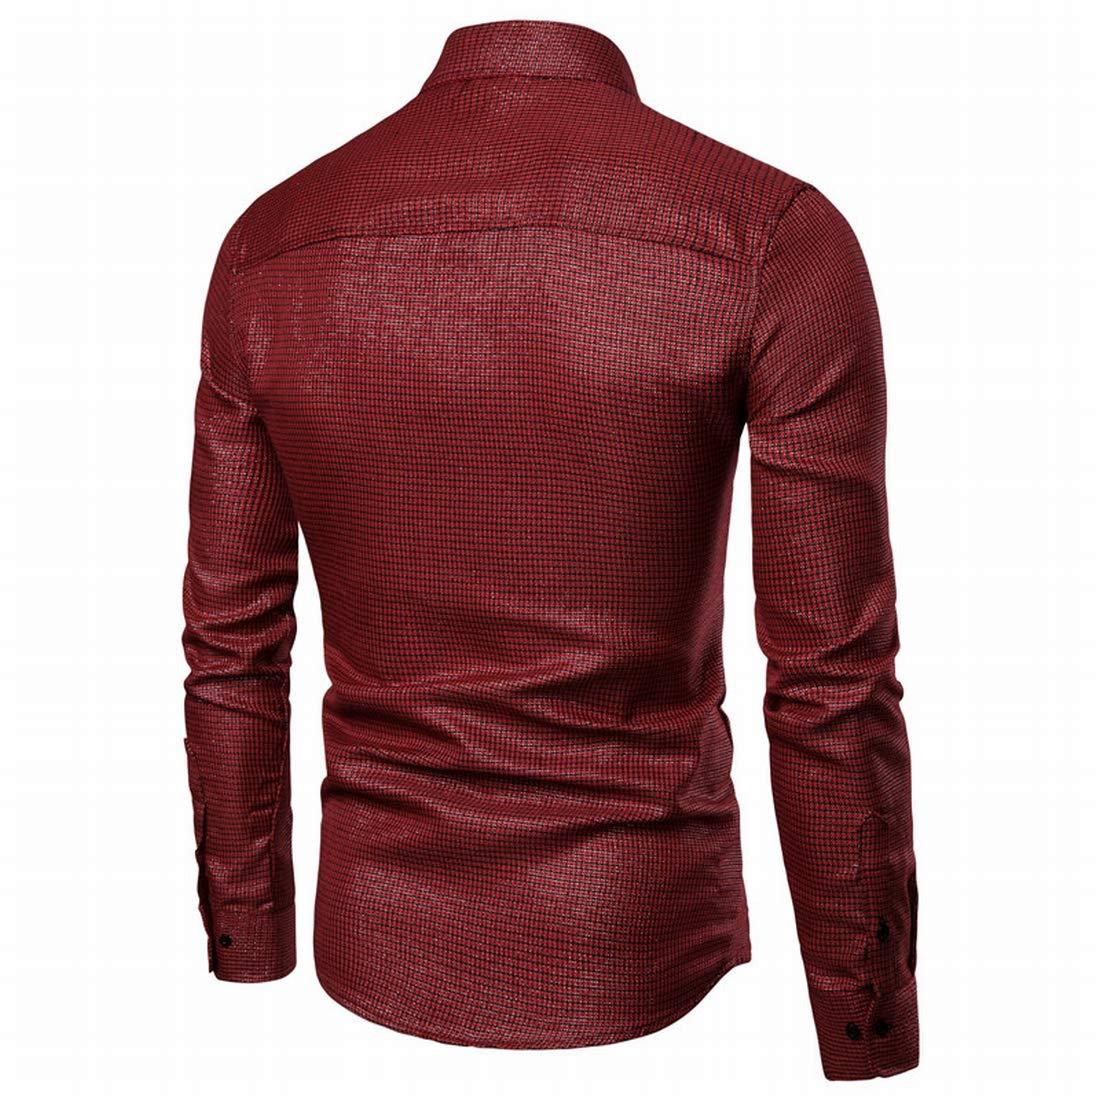 Nanquan Men Casual Shirt Slim-Fit Long-Sleeve Plaid Button Down Shirt